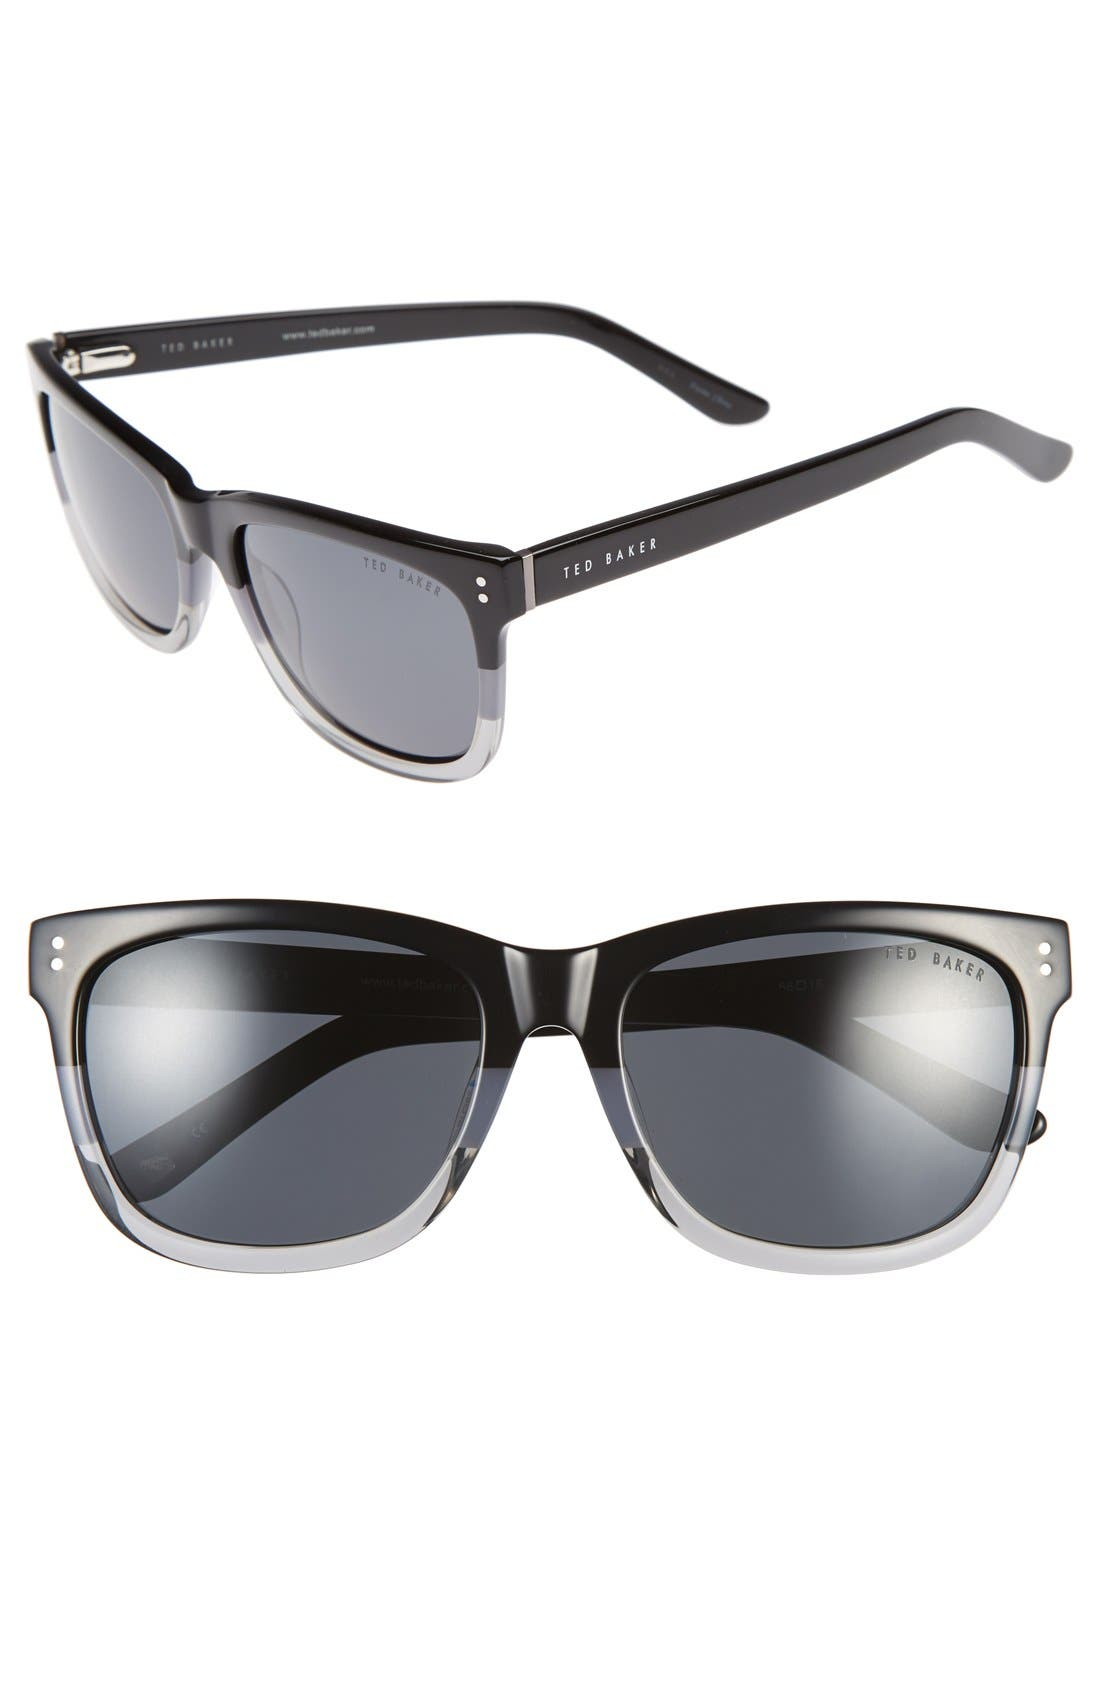 56mm Polarized Retro Sunglasses,                             Main thumbnail 1, color,                             001